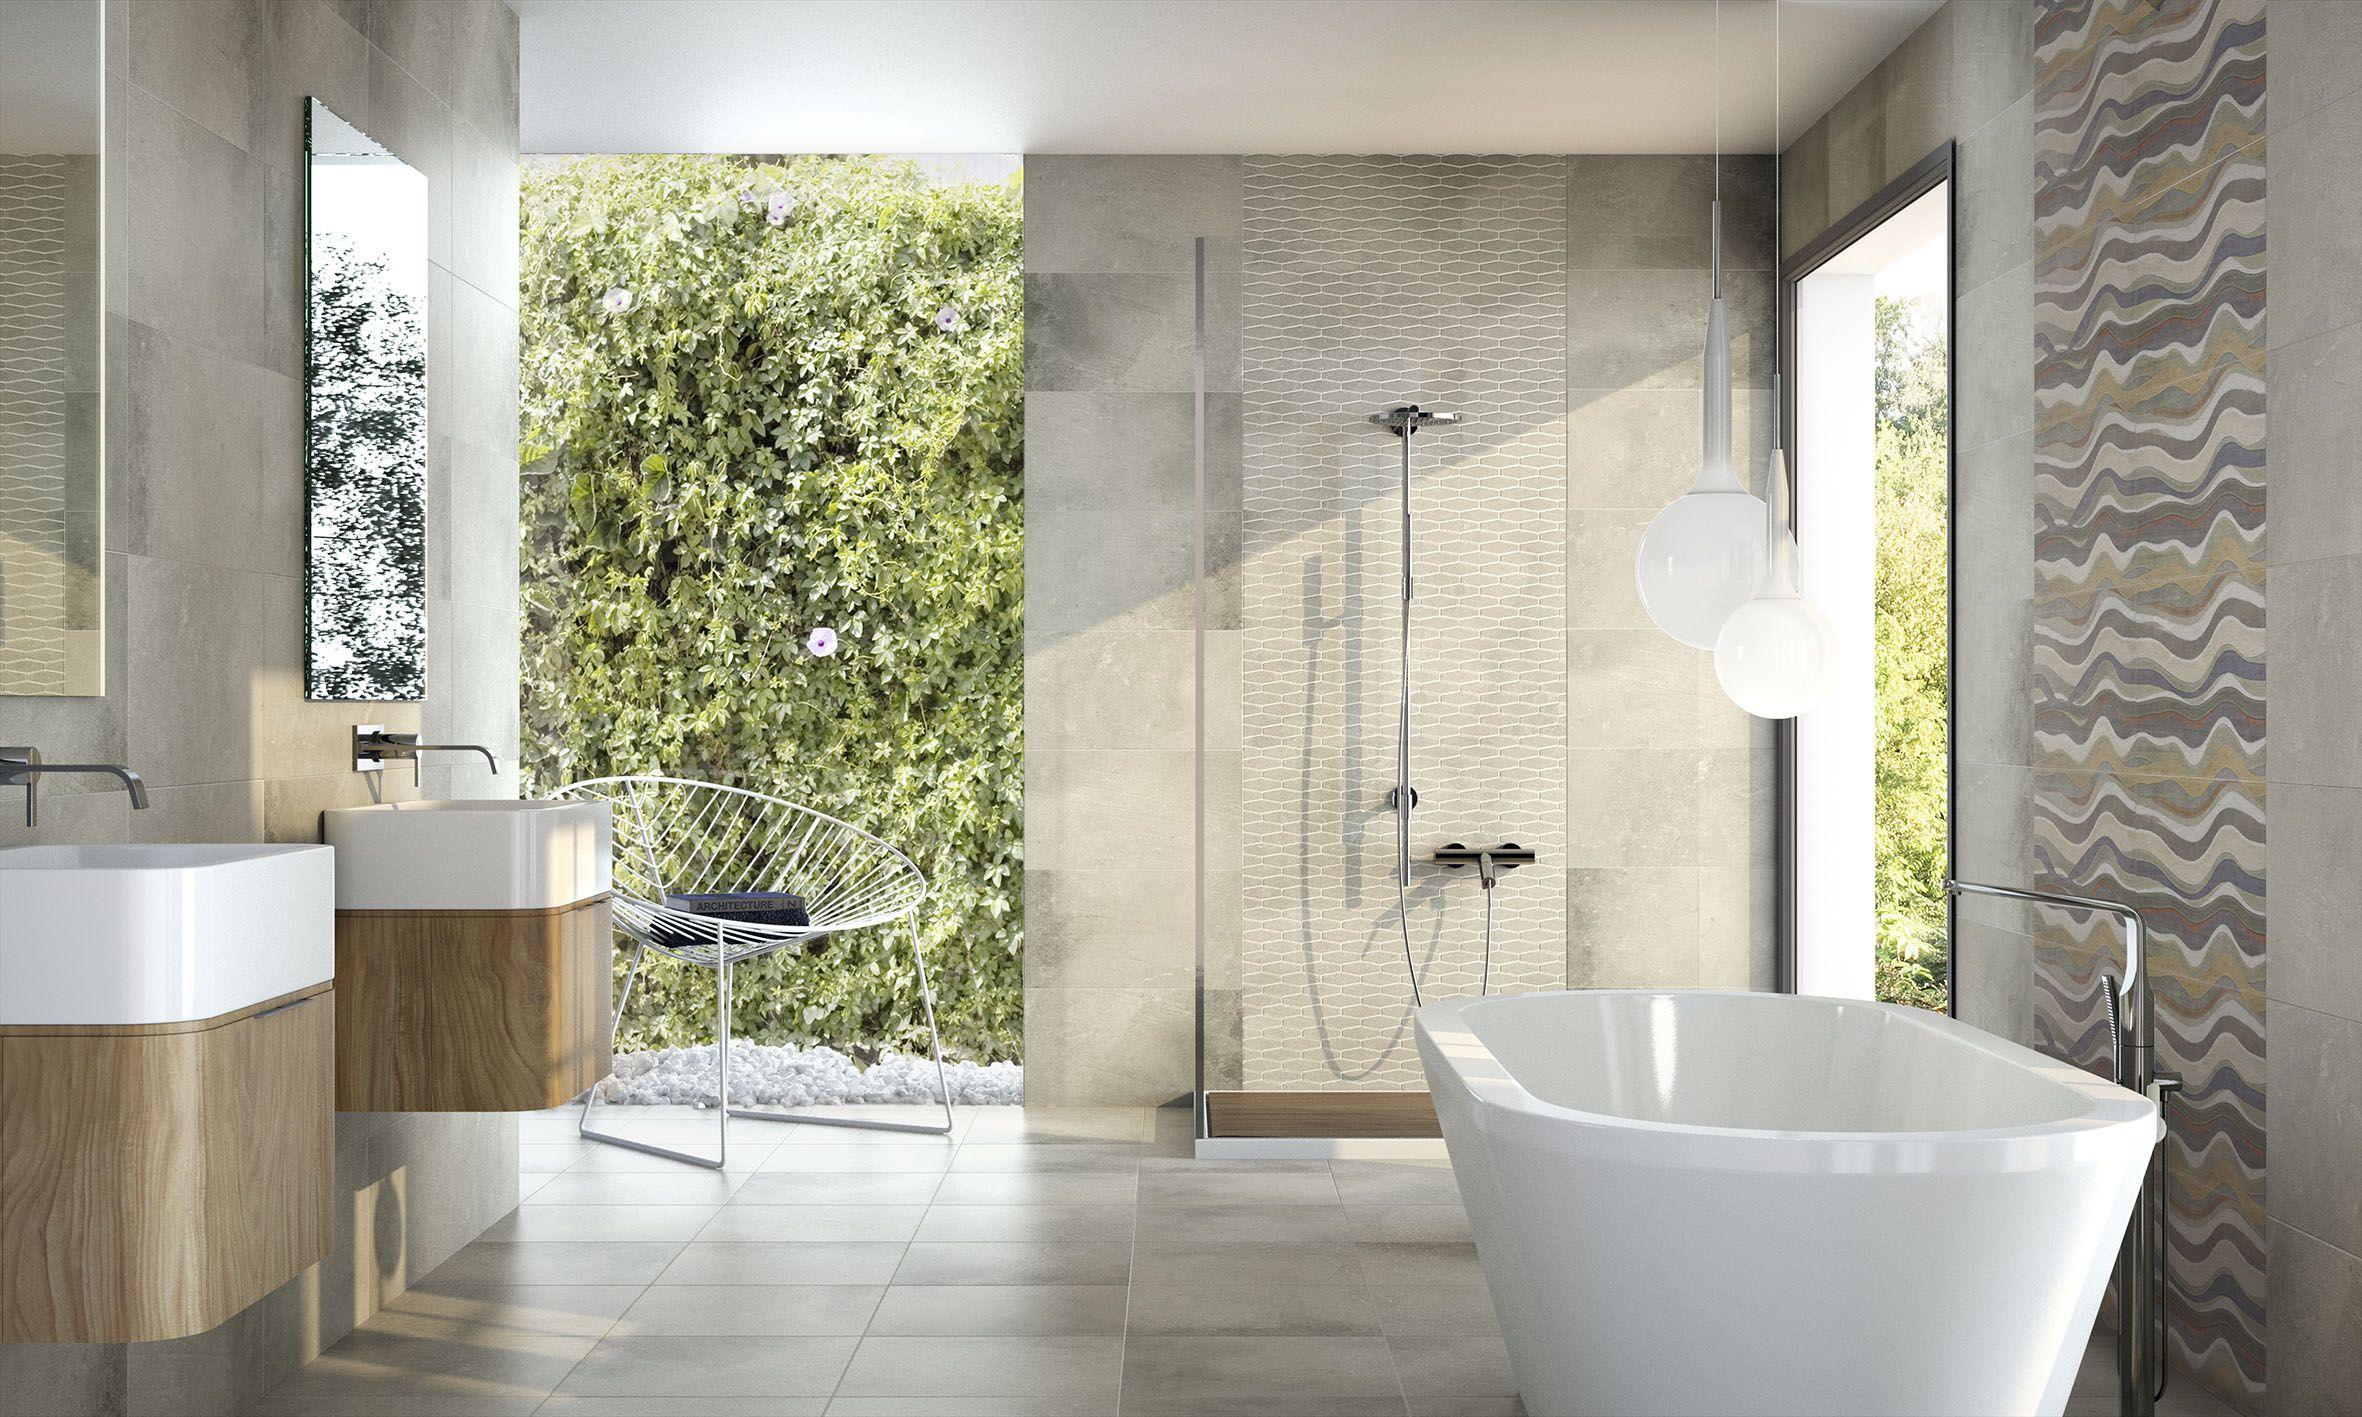 Bathroom design featuring the Habitat Dark Grey tile. #inspiration ...